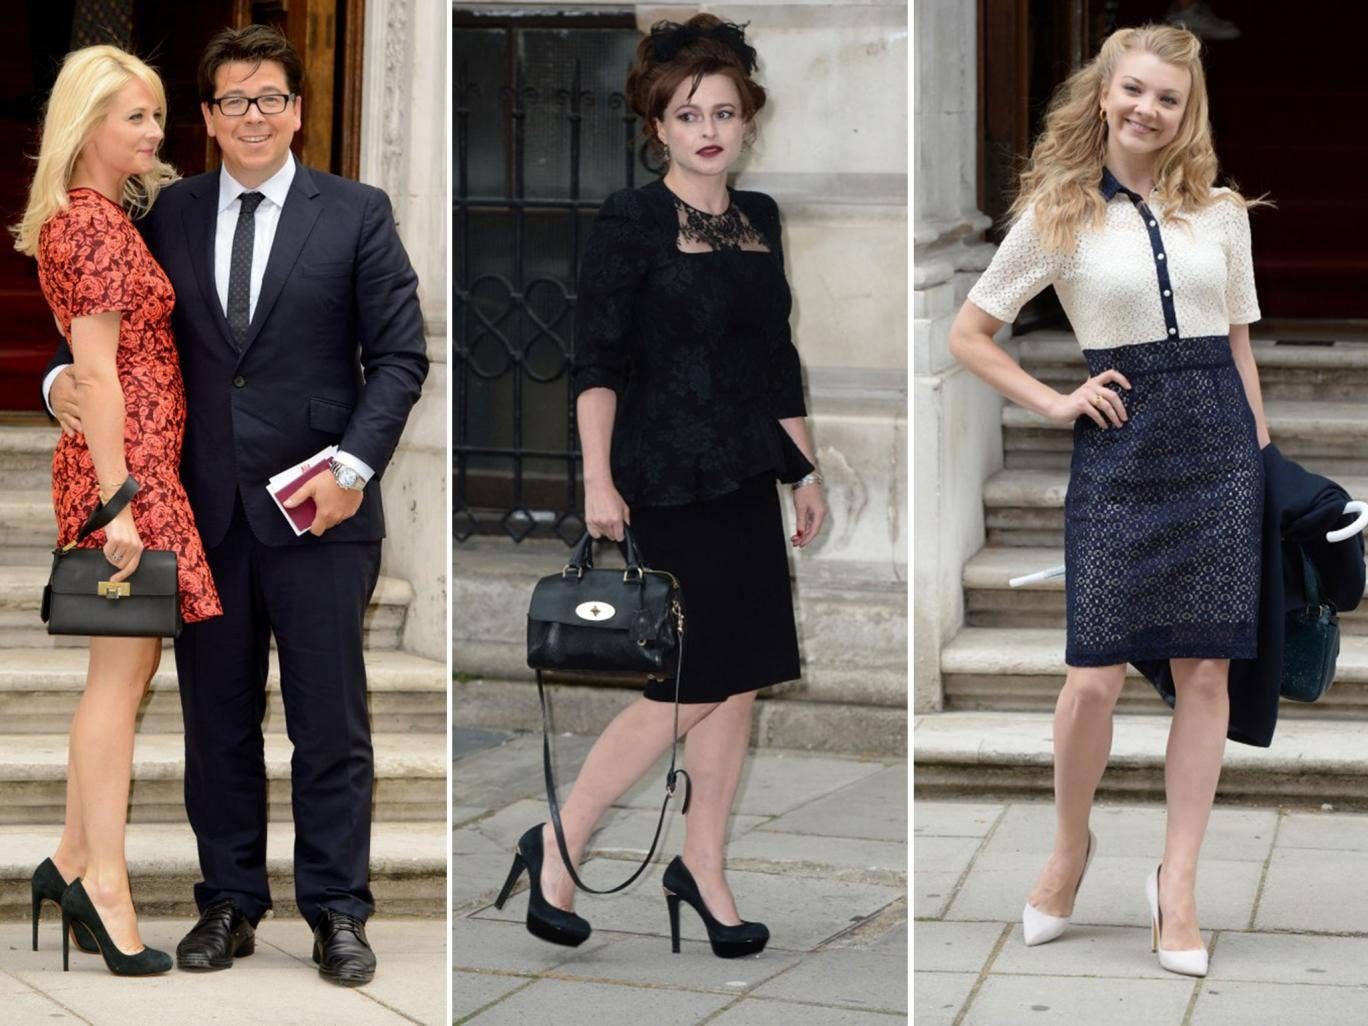 Michael McIntyre with his wife, Kitty; Helena Bonham Carter; and Natalie Dormer